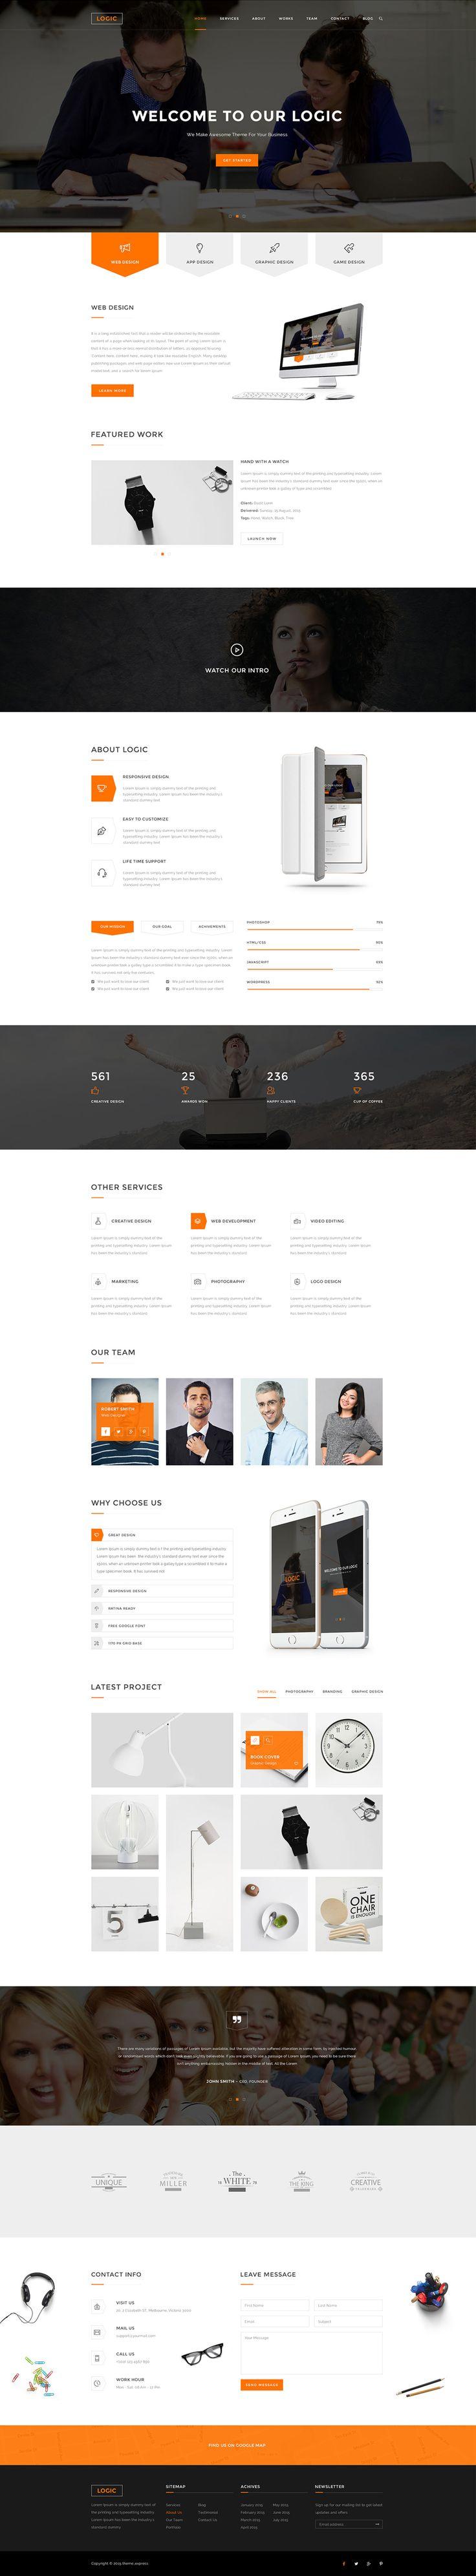 Free Multipurpose Business Web Template PSD